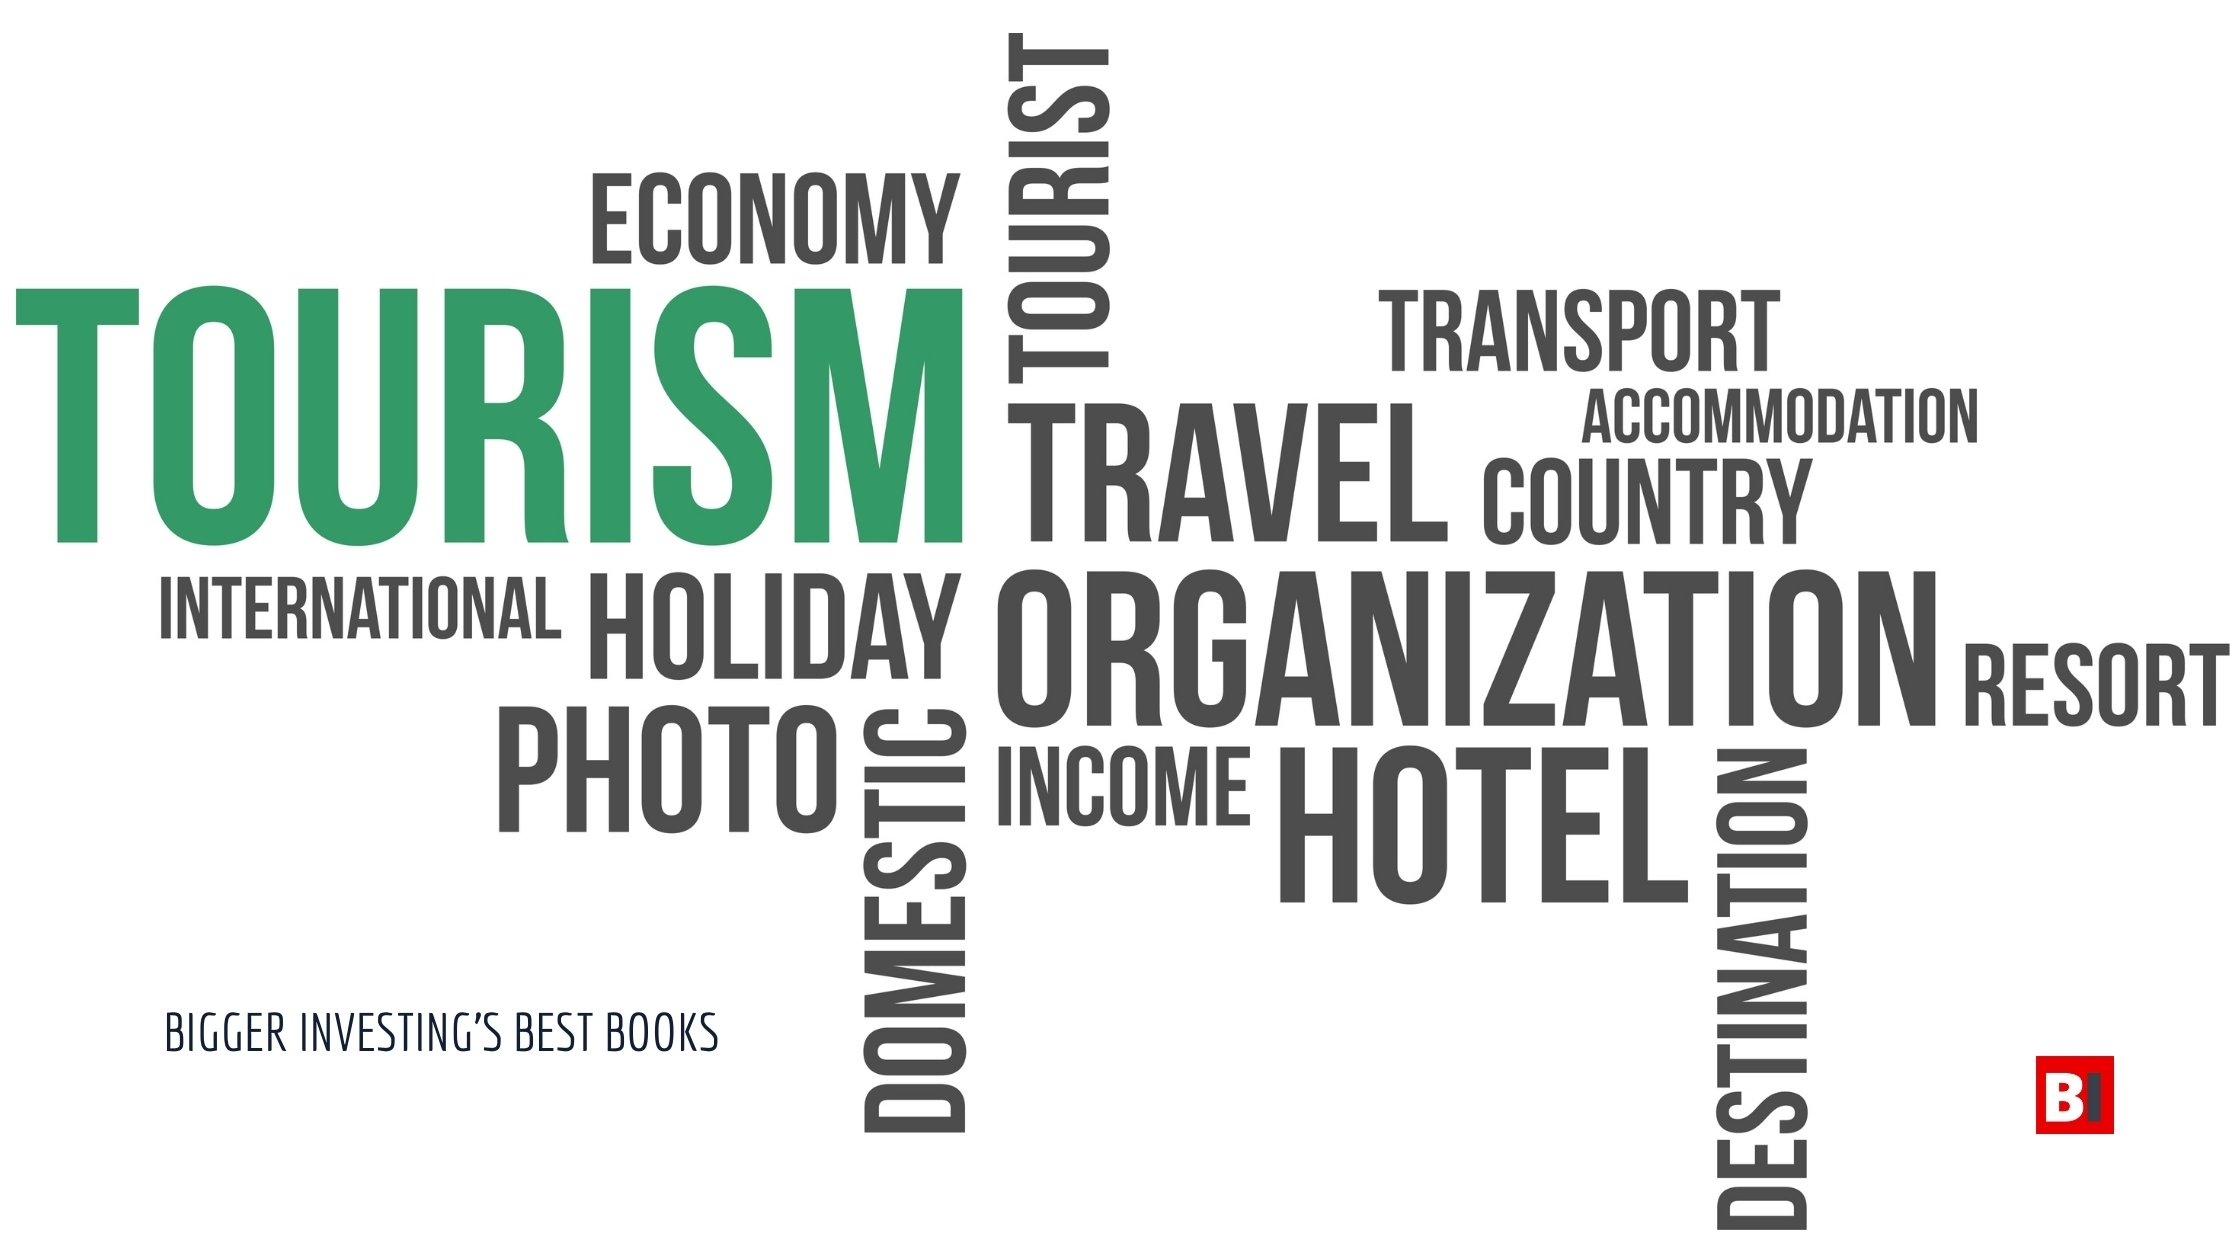 Best Books on Tourism